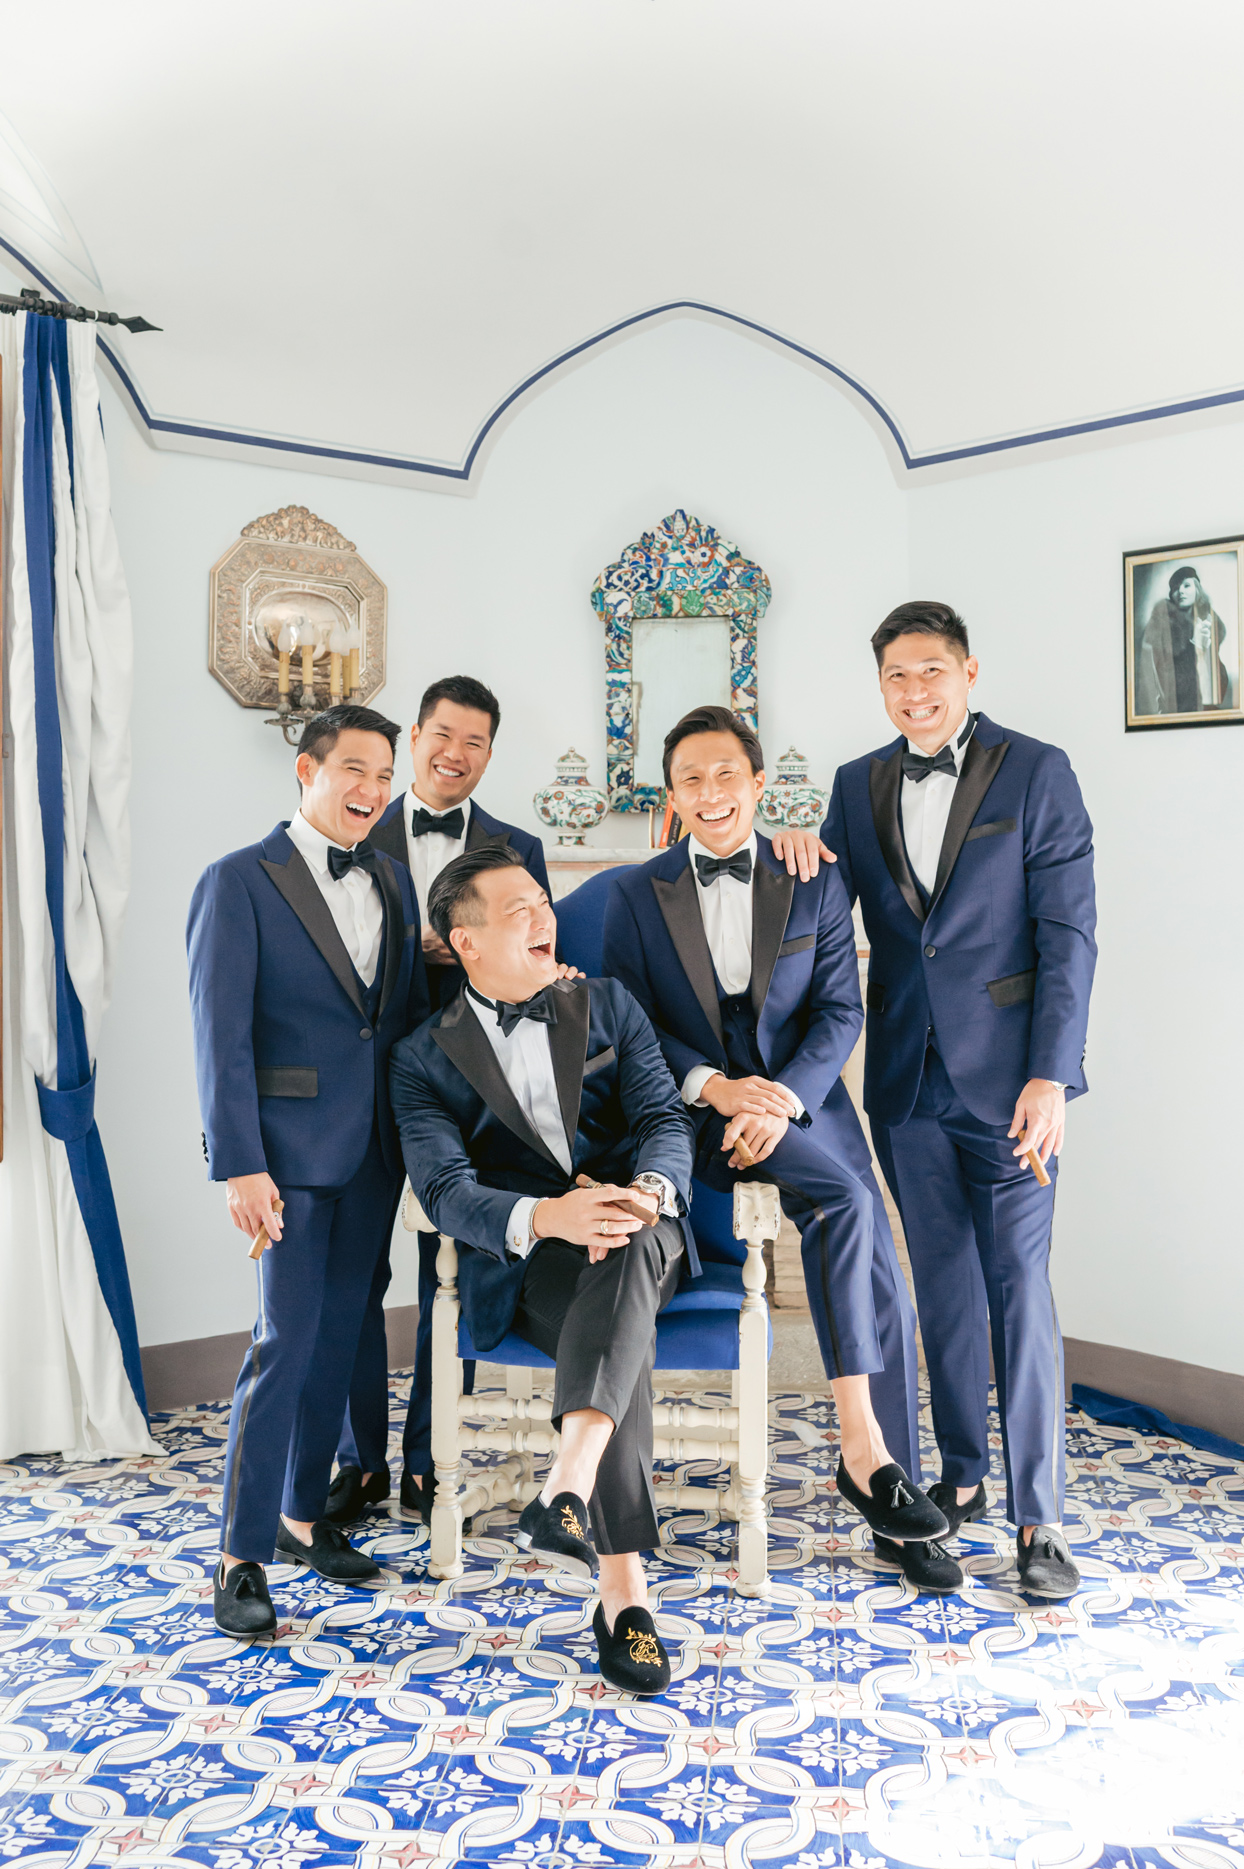 groom smiling with groomsmen wearing navy blue suits